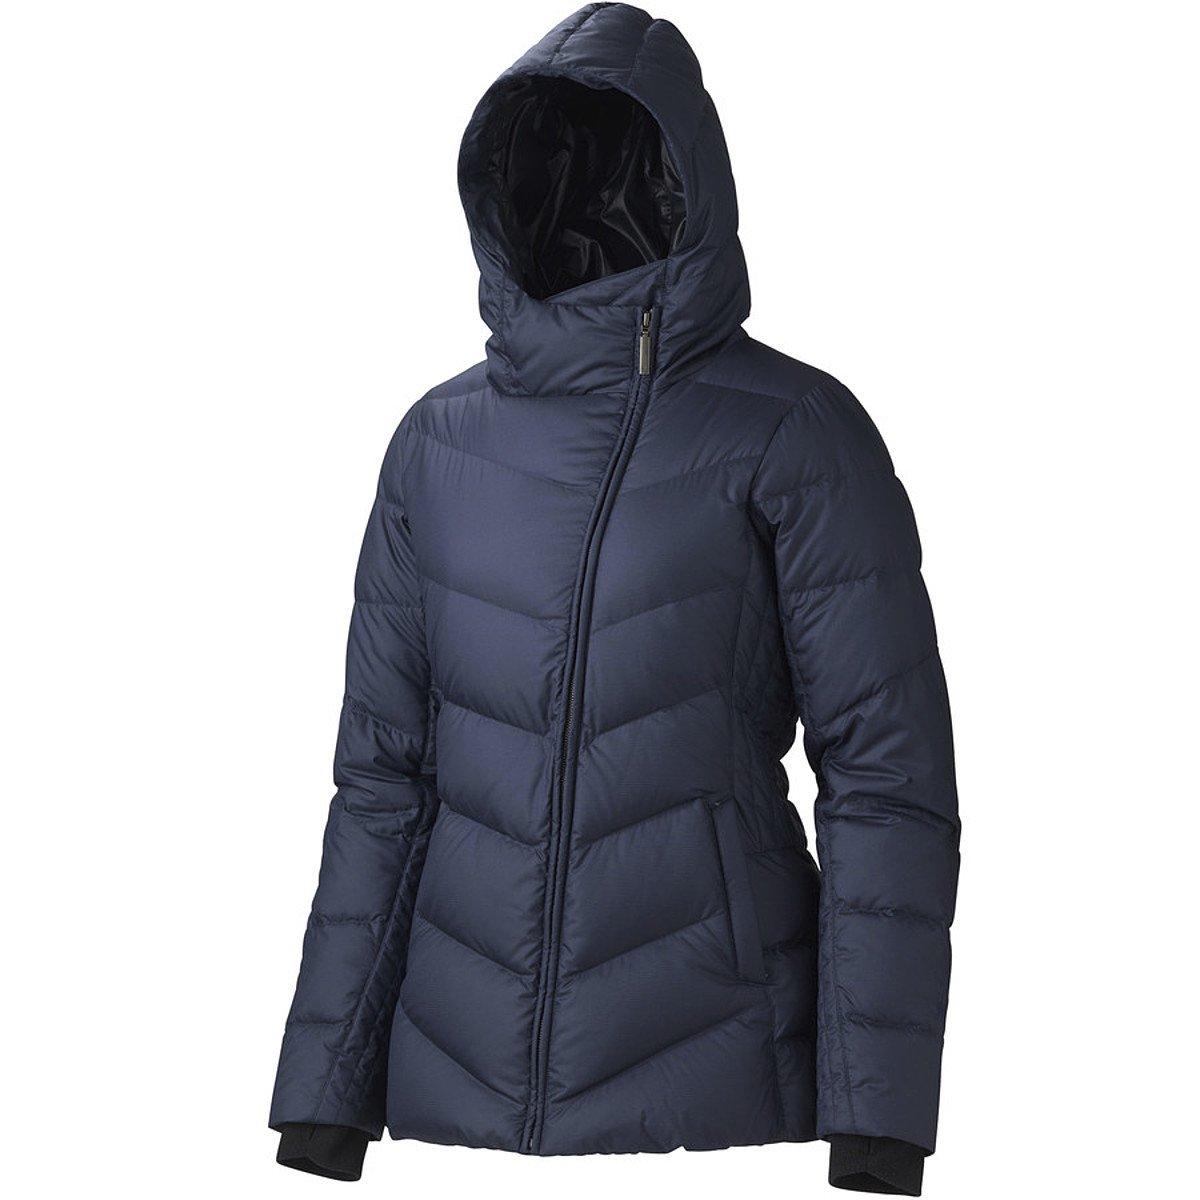 Marmot Kinder Winterjacke Women'Carina kaufen